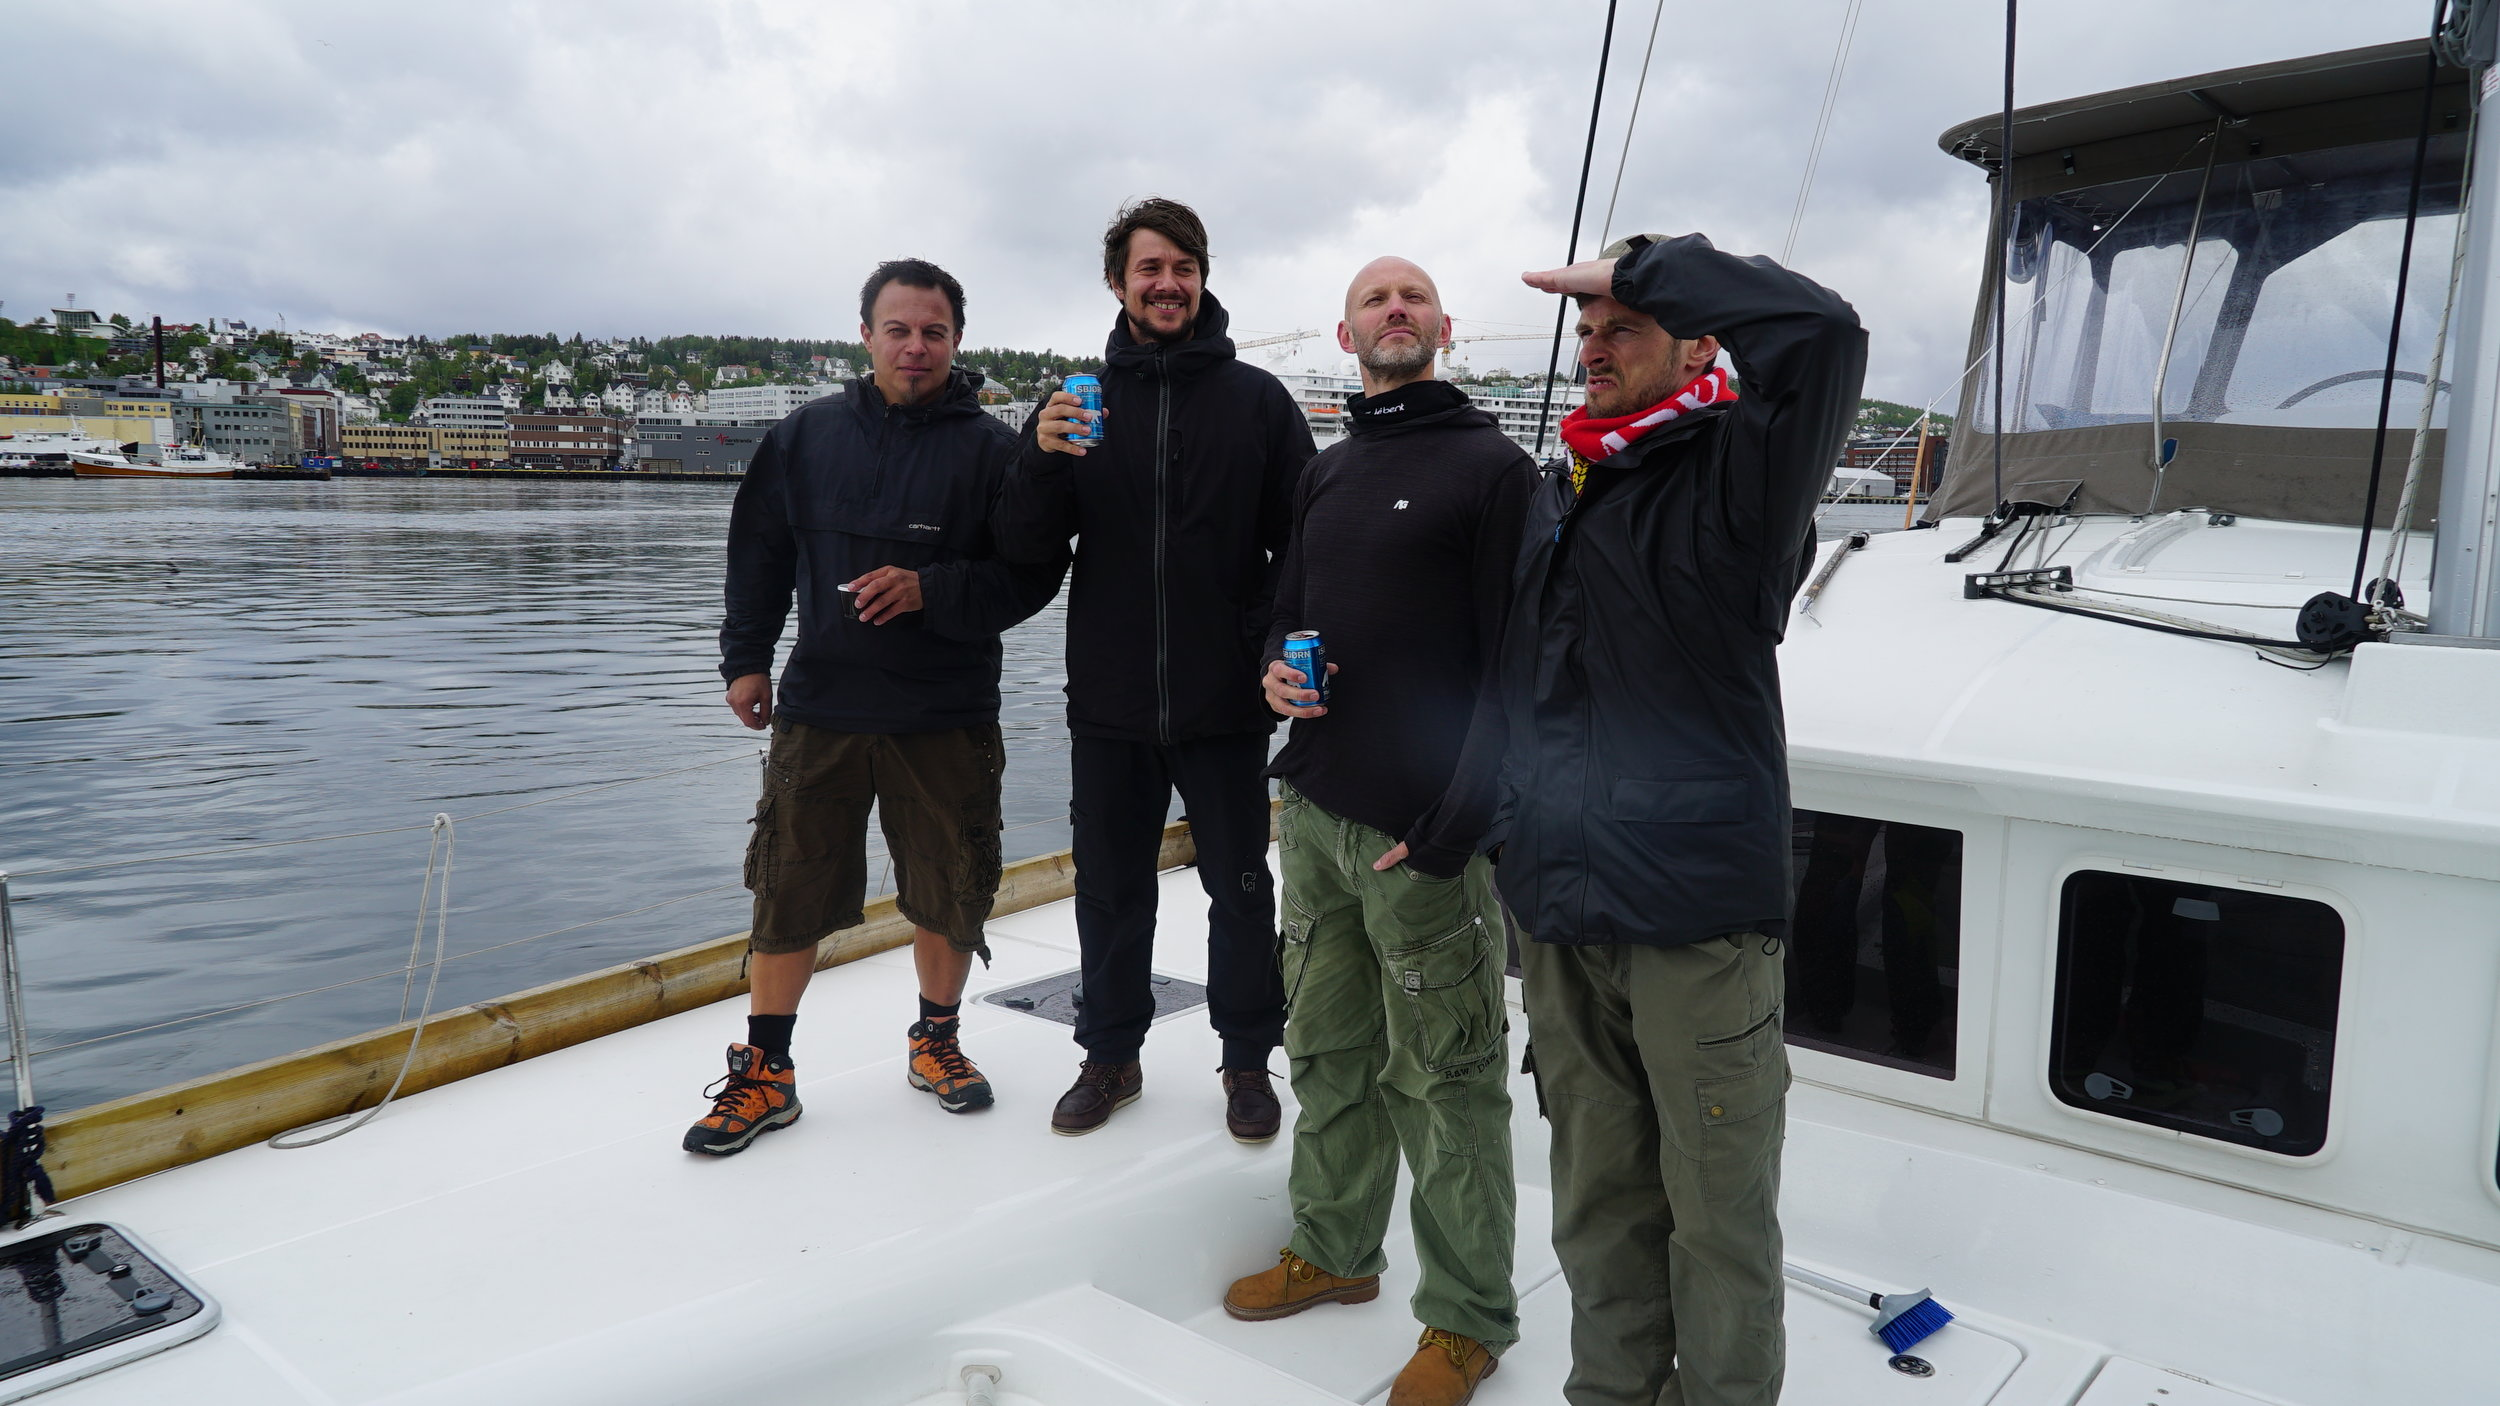 Utdrikningslag | #Tromsø | #Sail and Relax